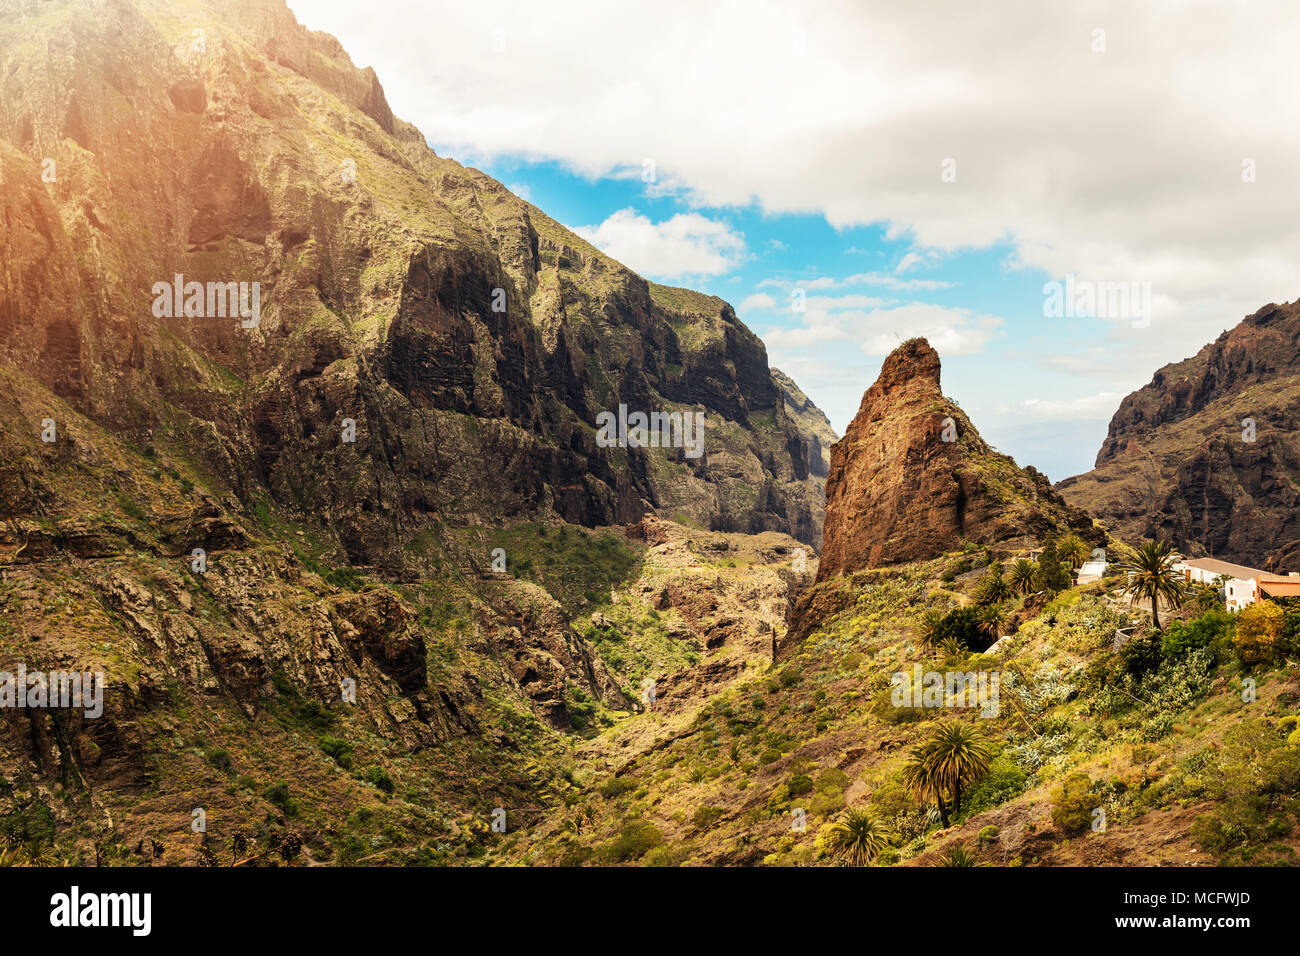 Masca Dorf Teneriffa-Kanarische Inseln-Spanien Stockbild